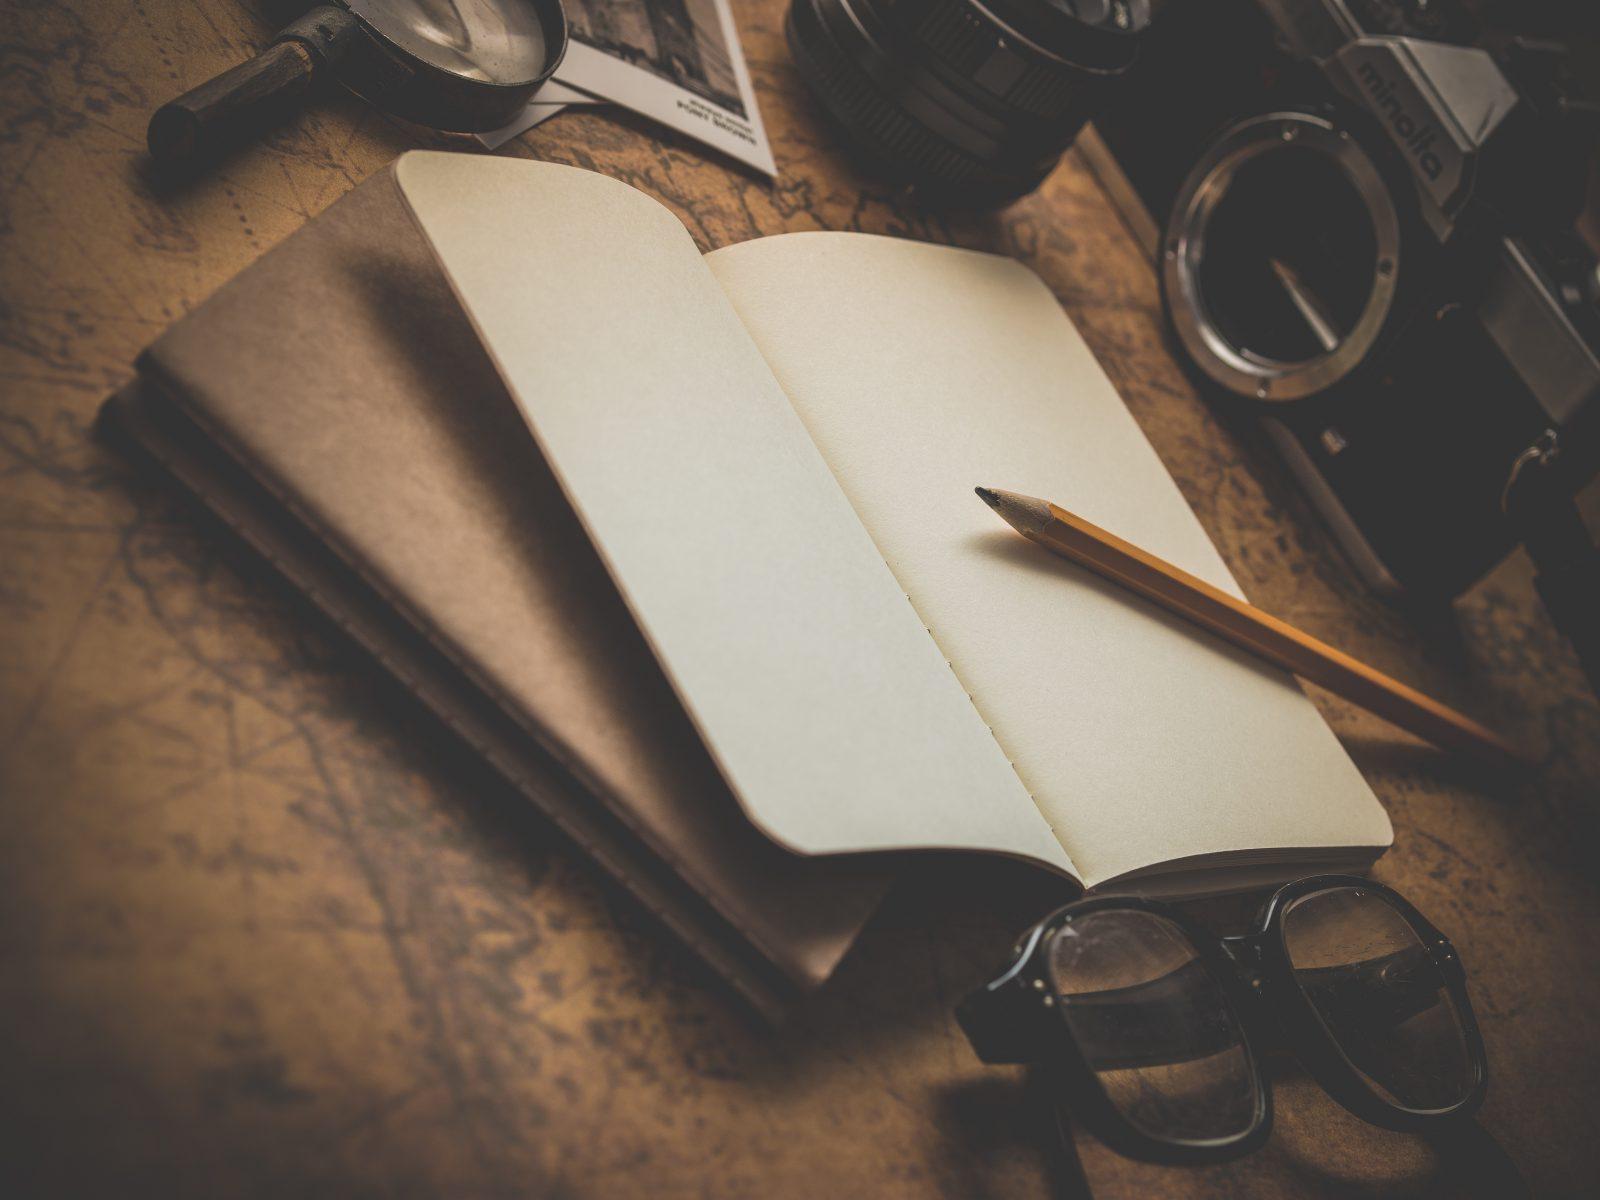 unsplash, notepad, pencil, camera, adventure, planning, trip